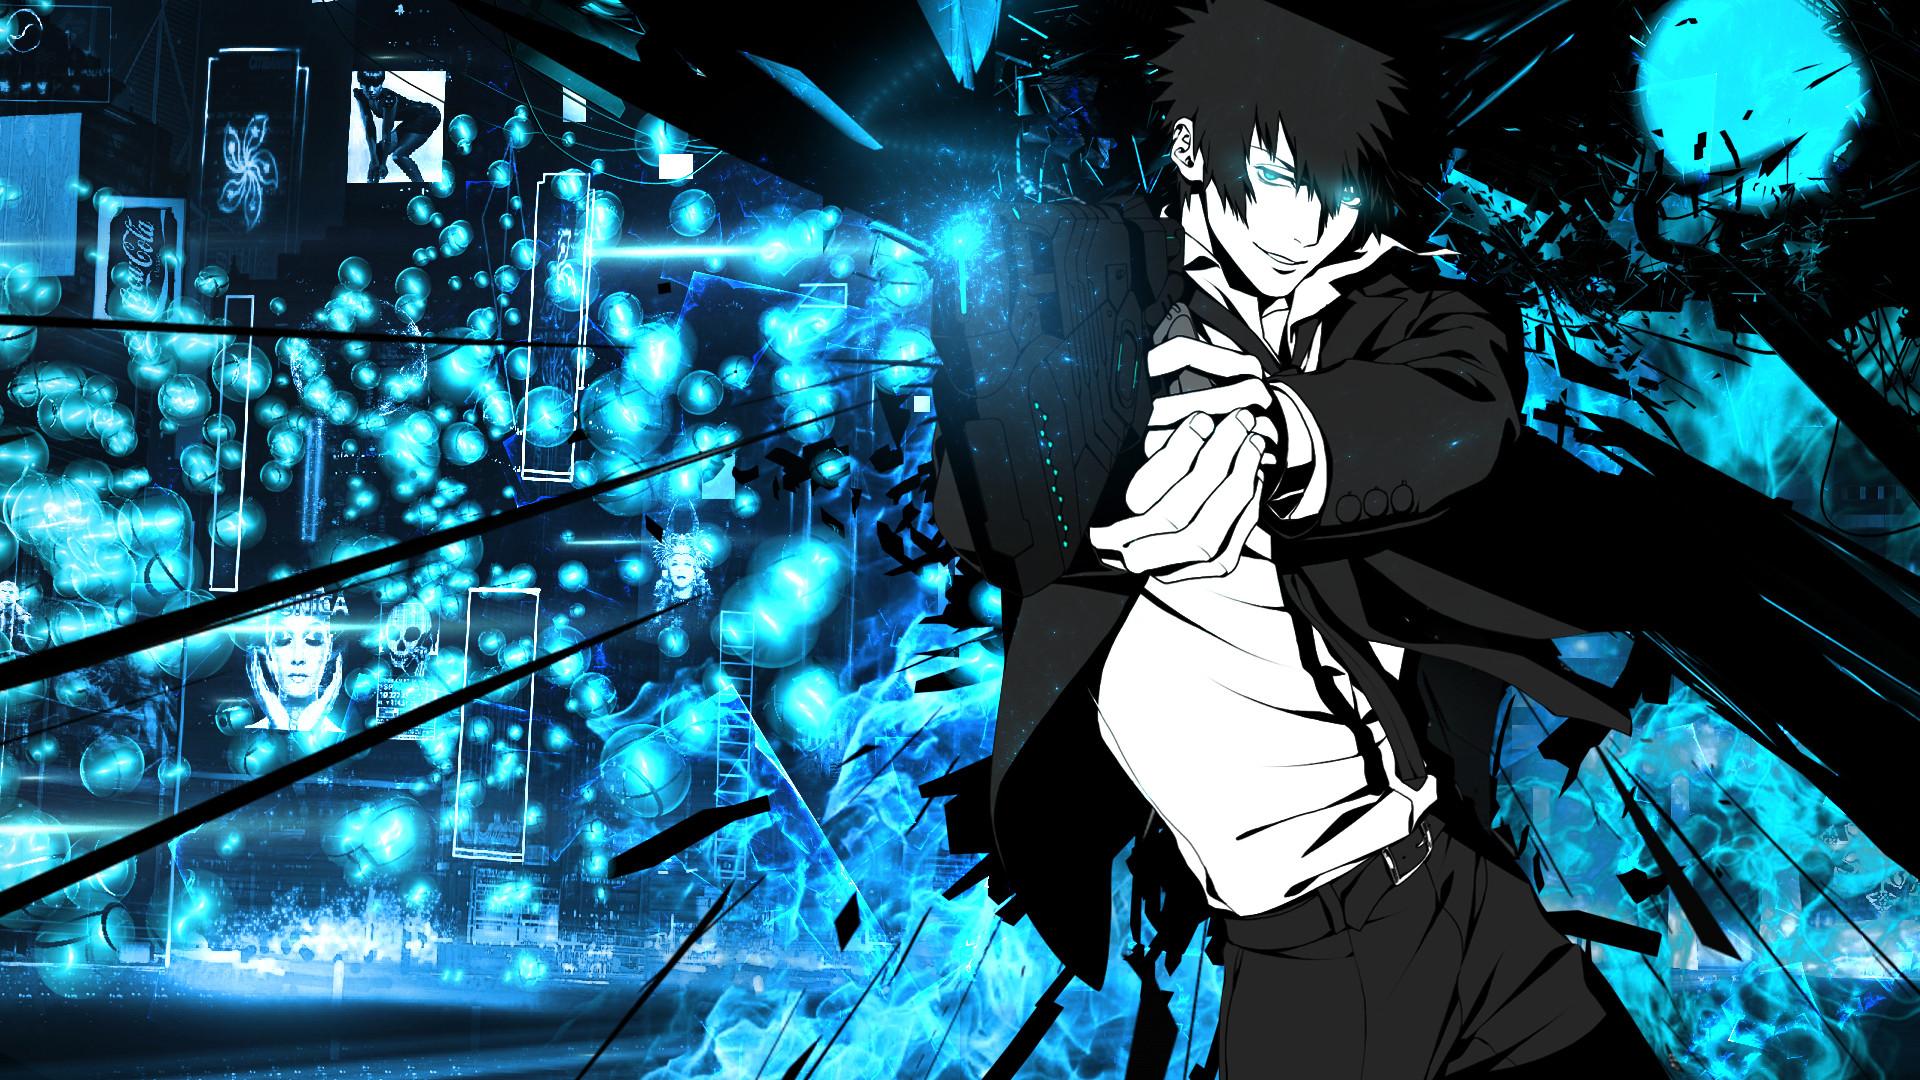 … Psycho-Pass Kogami Wallpaper by Pact-0f-Brotherhood